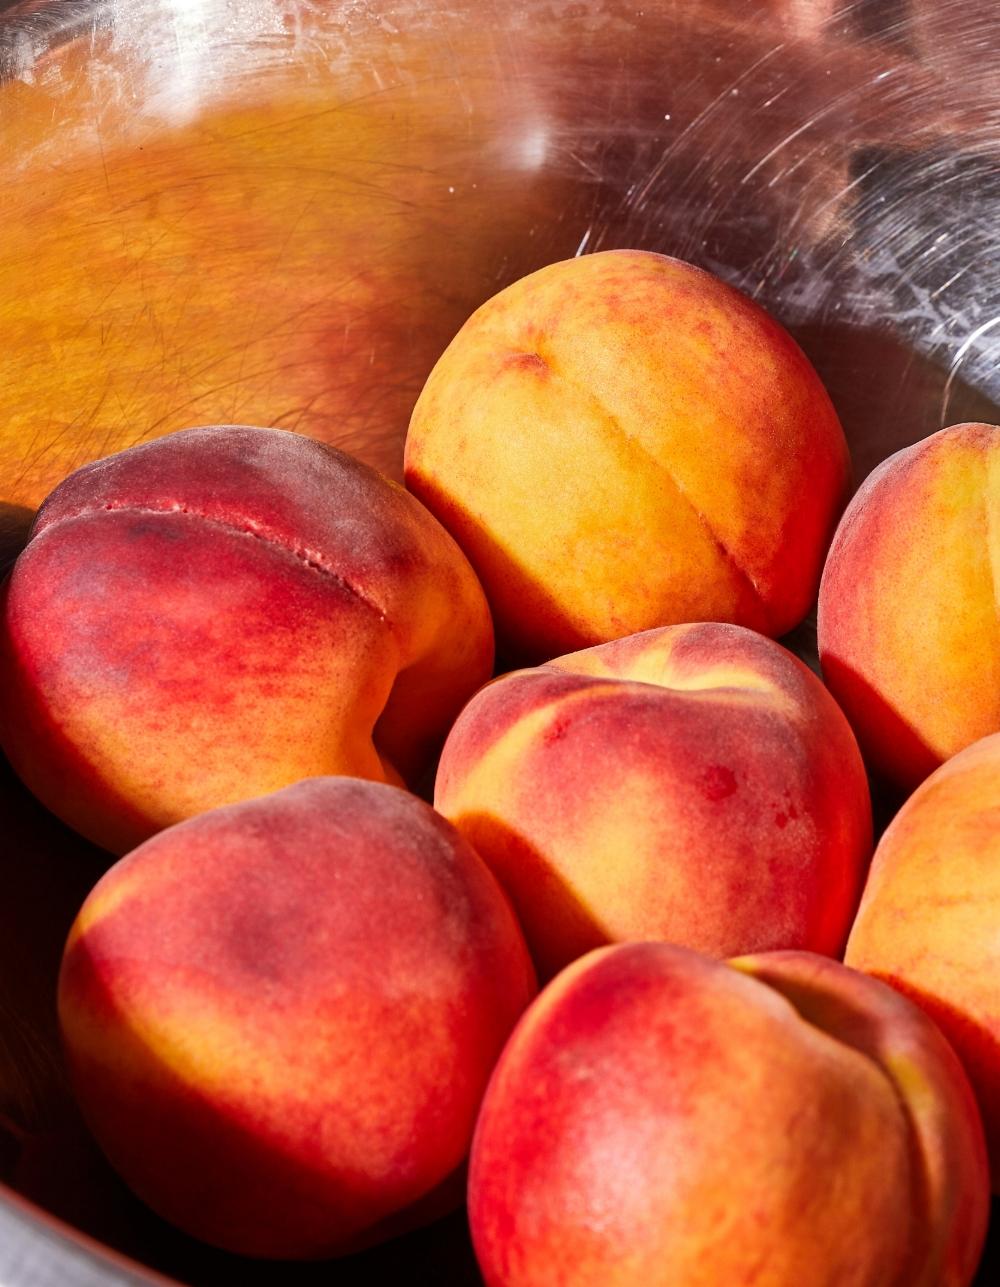 NS_2018_08_DI_Microsite_Peaches 1.jpg